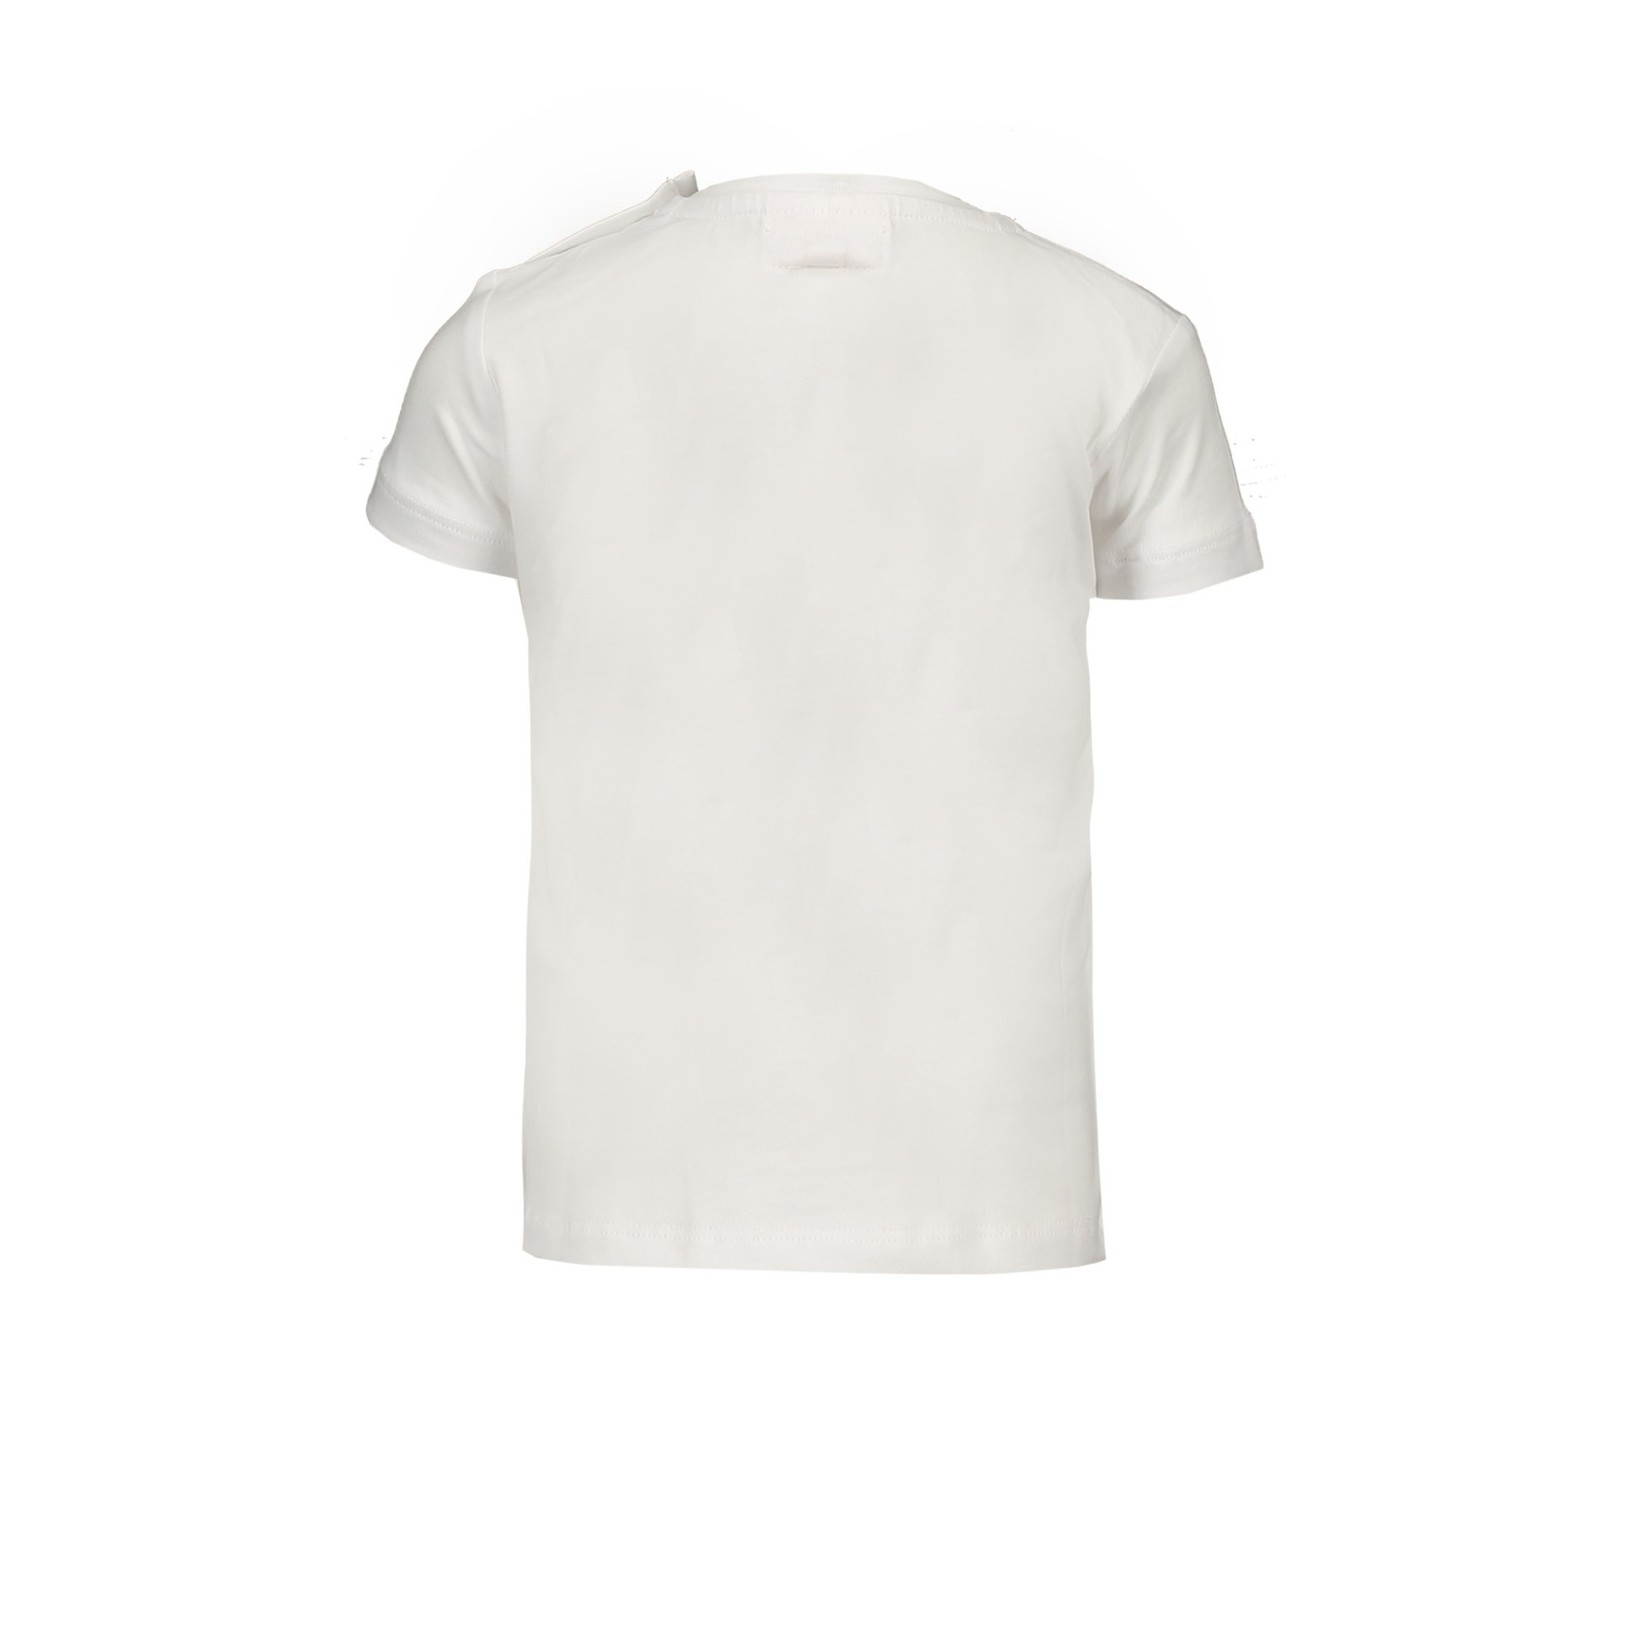 Le Chic Le Chic T-shirt Sea Sand Sun